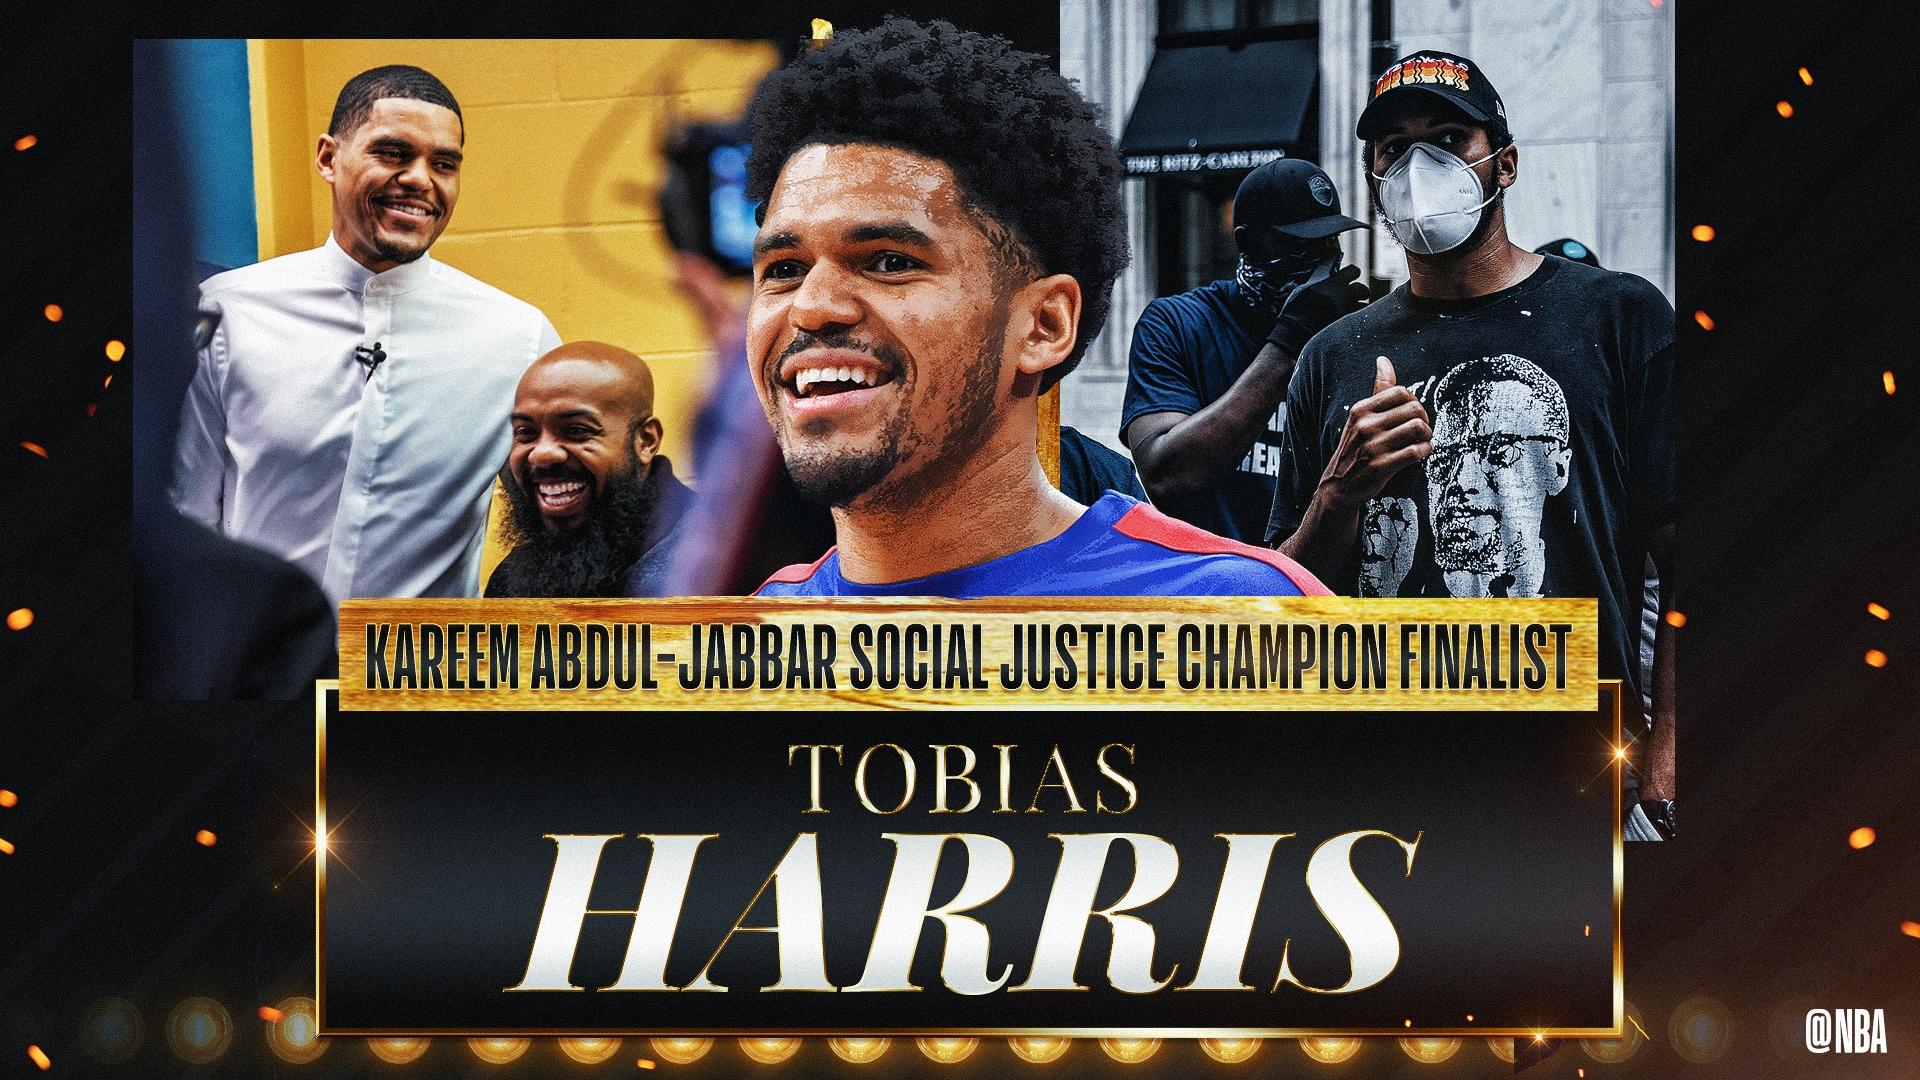 Kareem Abdul-Jabbar Social Justice Champion Finalist: Tobias Harris